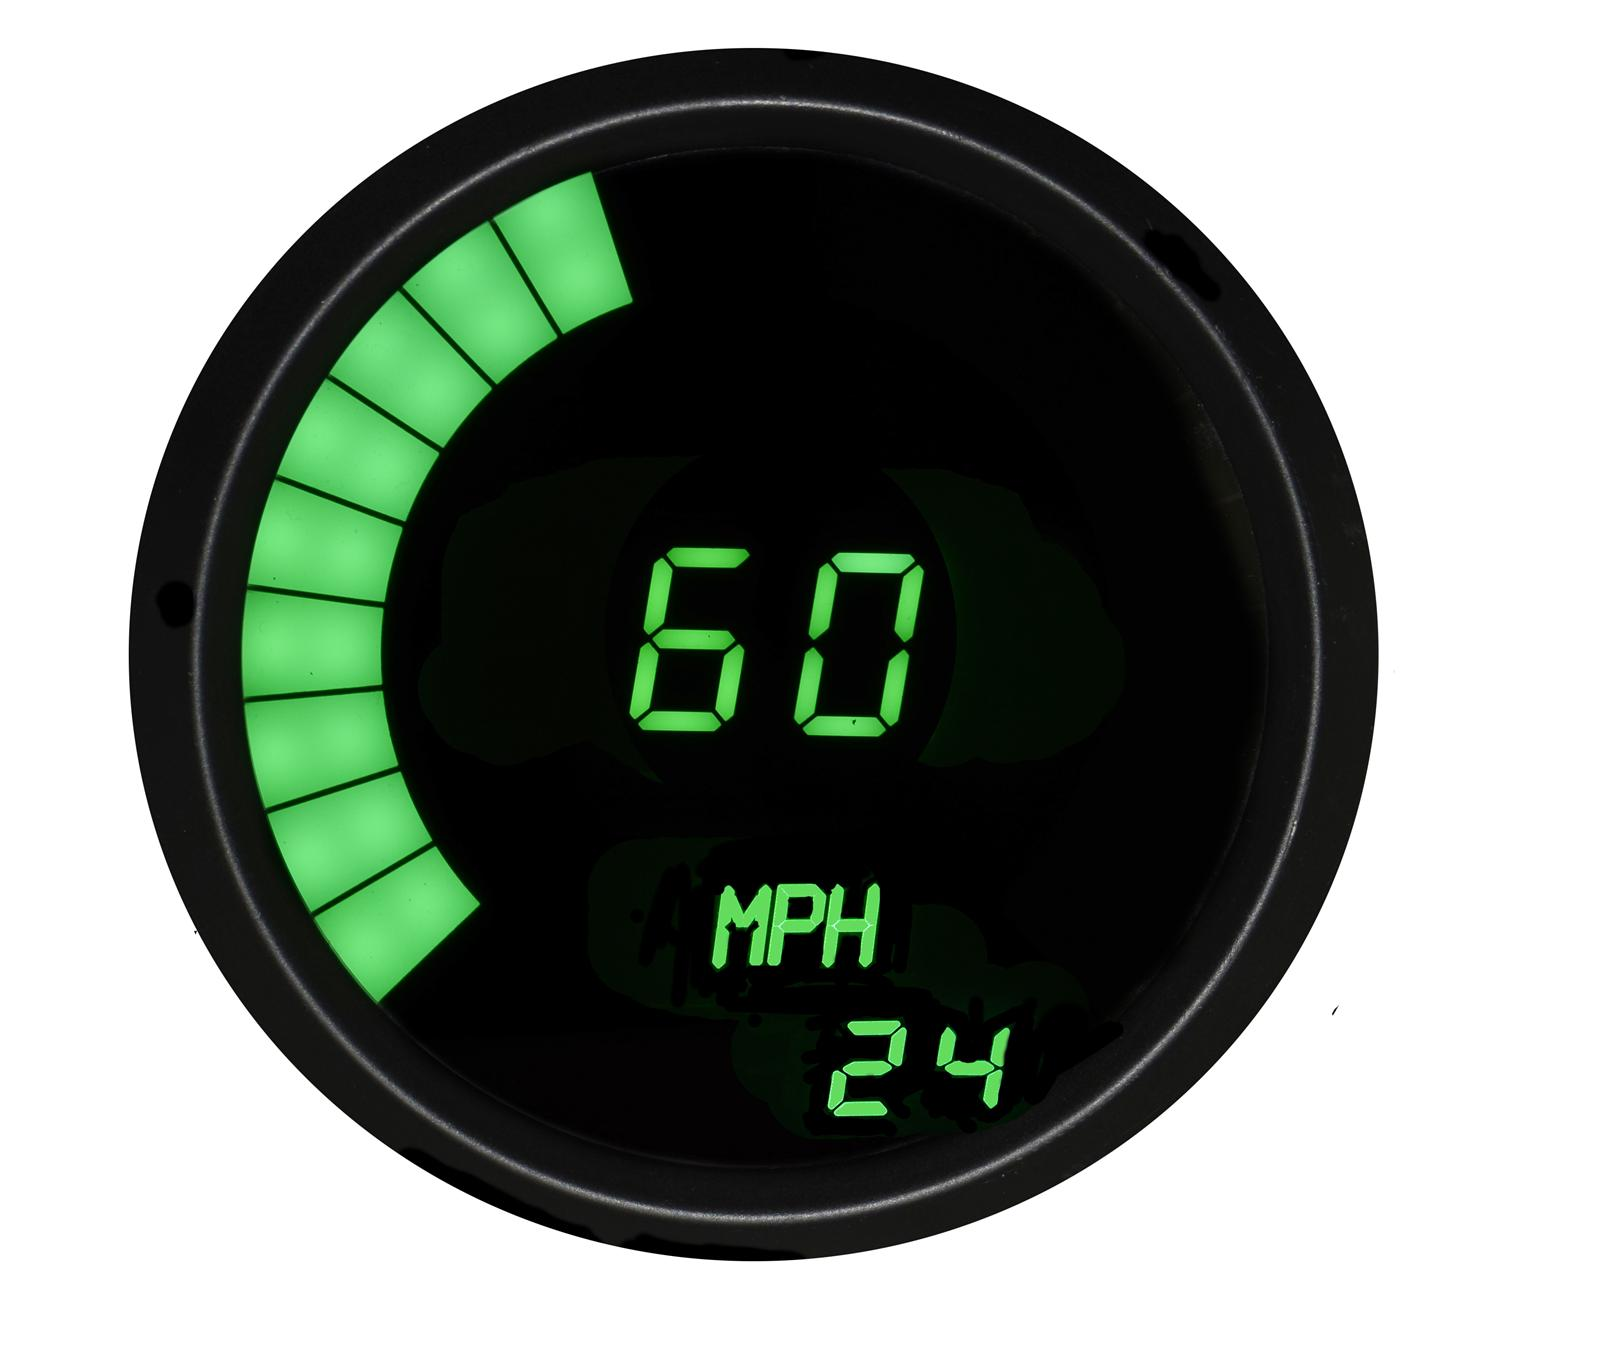 Intellitronix Led Digital Gauges : Intellitronix led digital speedometer m g ebay